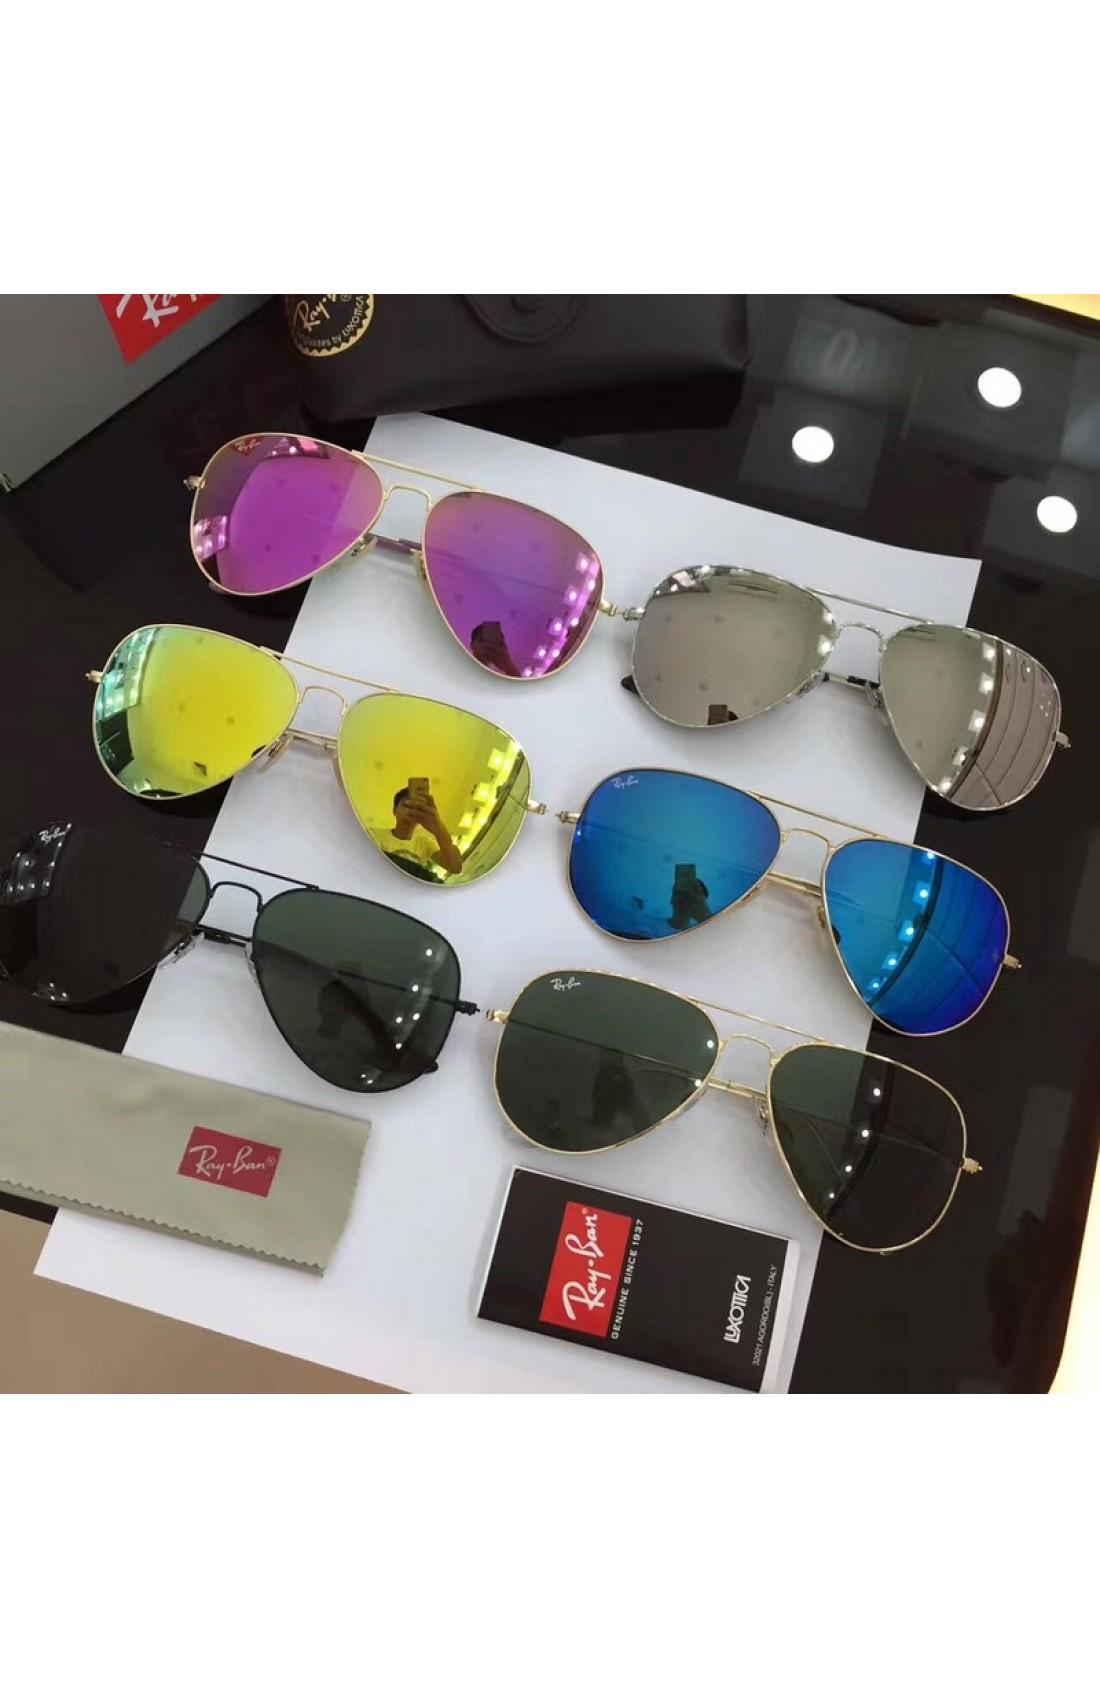 aeb14d3eb0 Clearance Sale Men s Women s Black Aviator Sunglasses Ray Ban